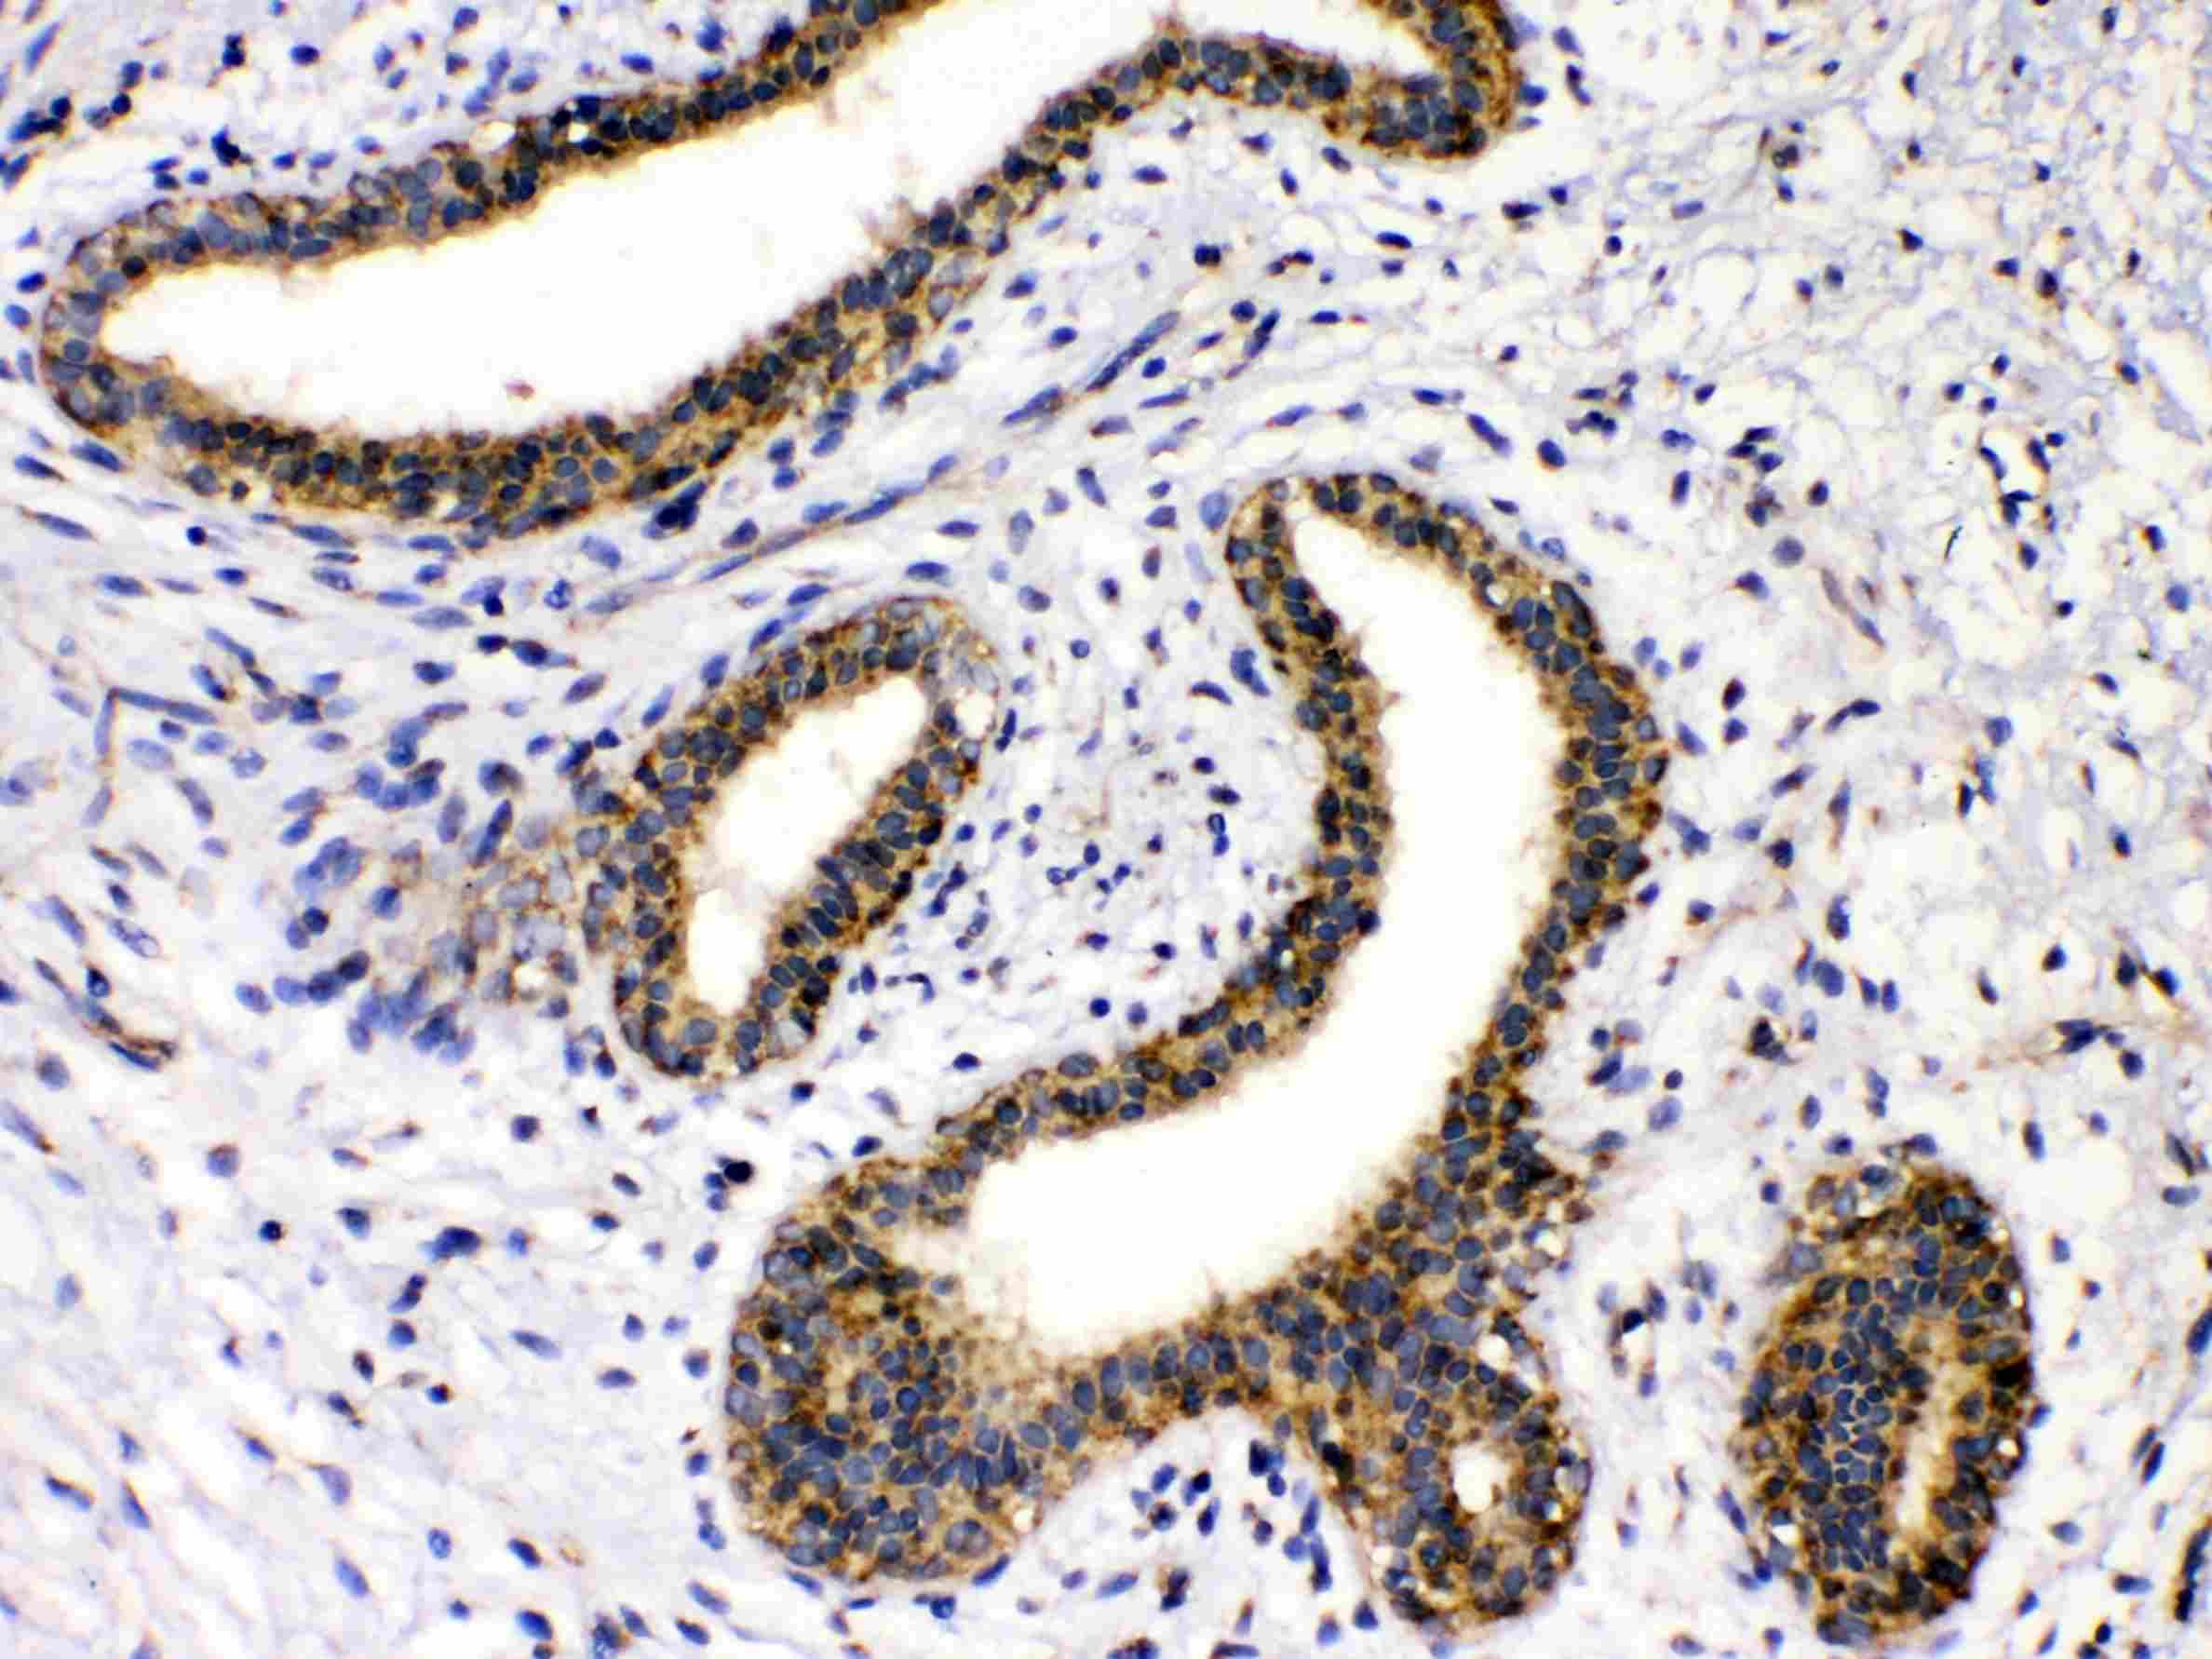 GAD65 Antibody in Immunohistochemistry (Paraffin) (IHC (P))